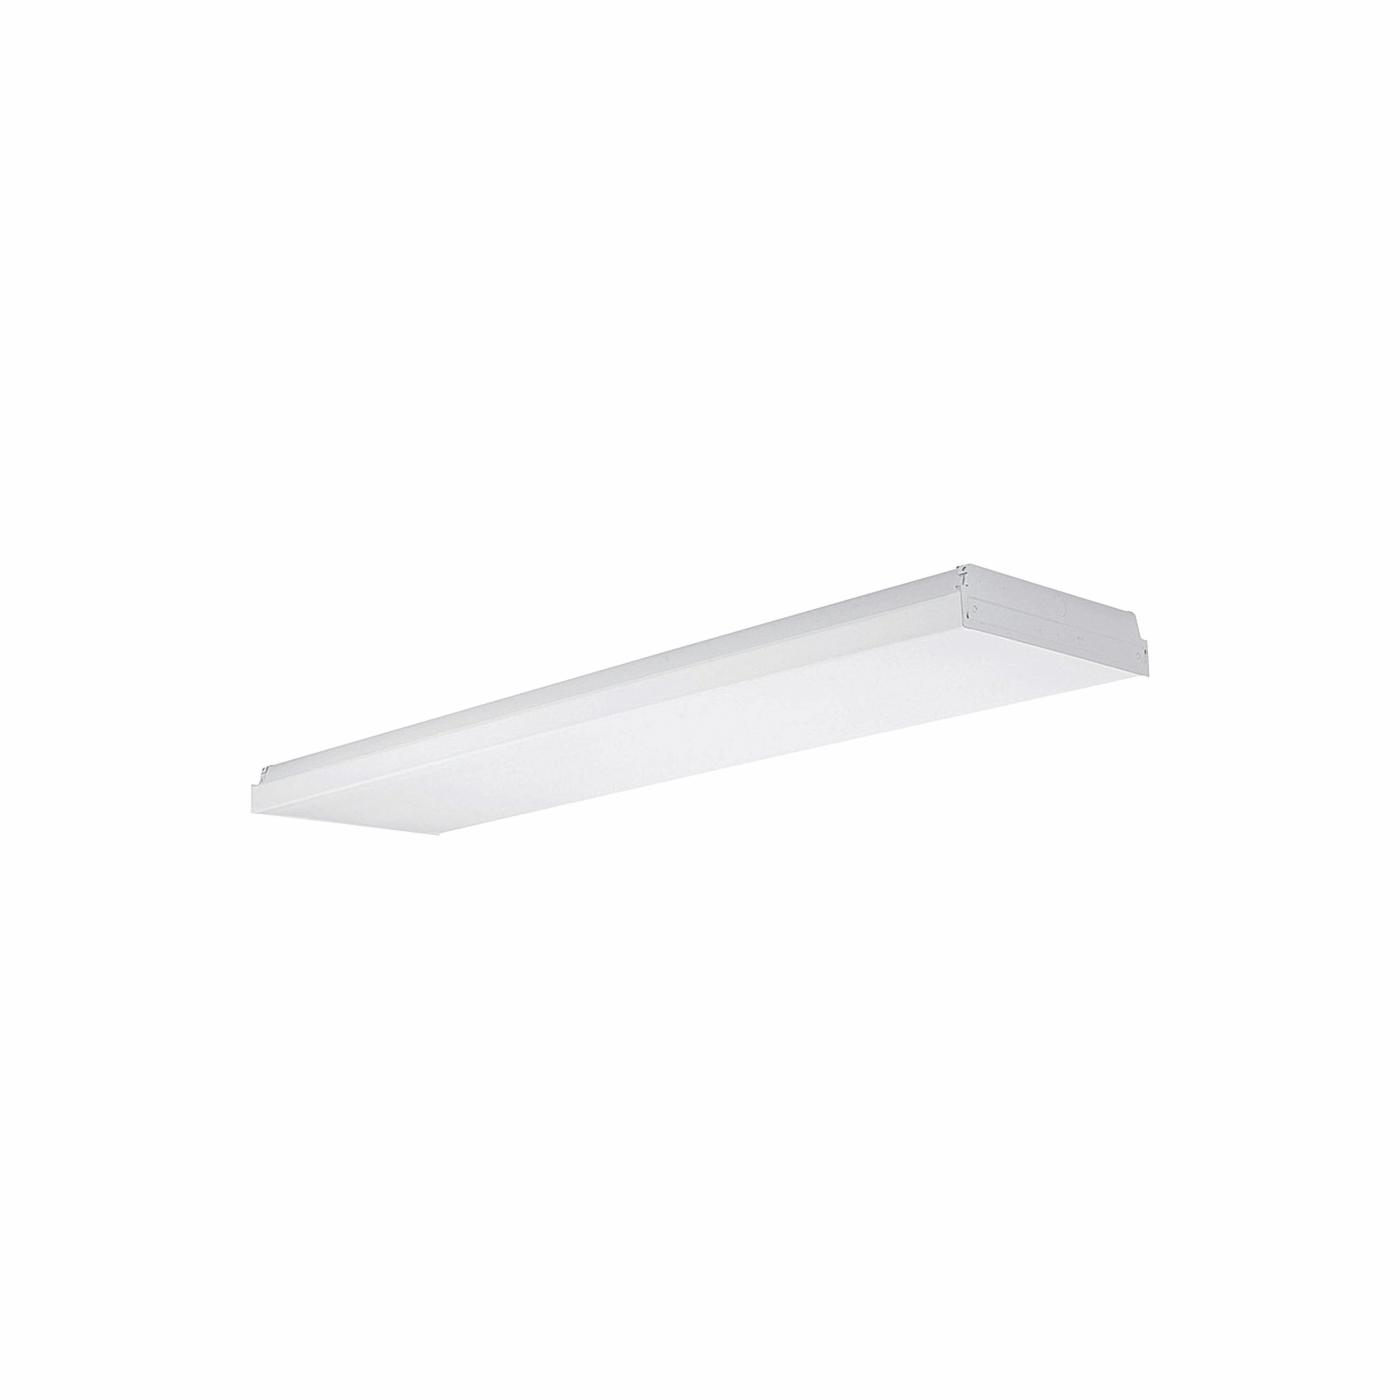 Lithonia Lighting 256439